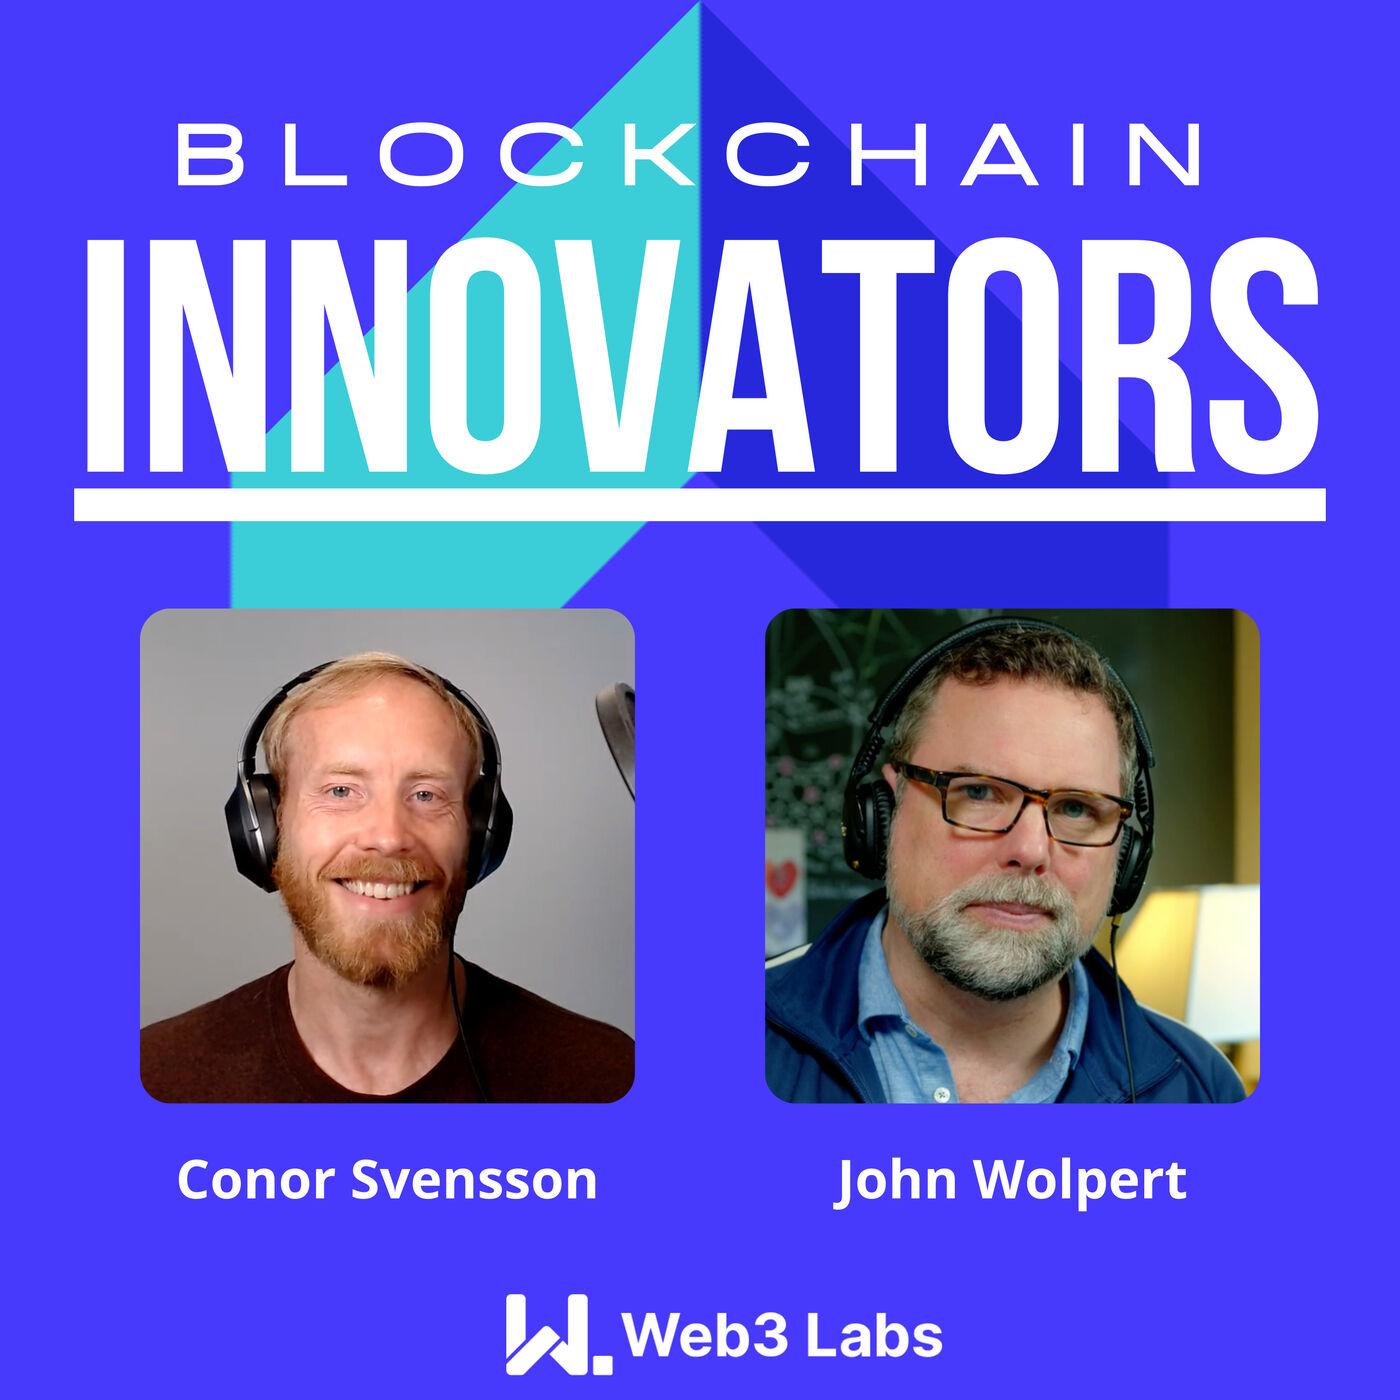 Blockchain Innovators with Conor Svensson and John Wolpert